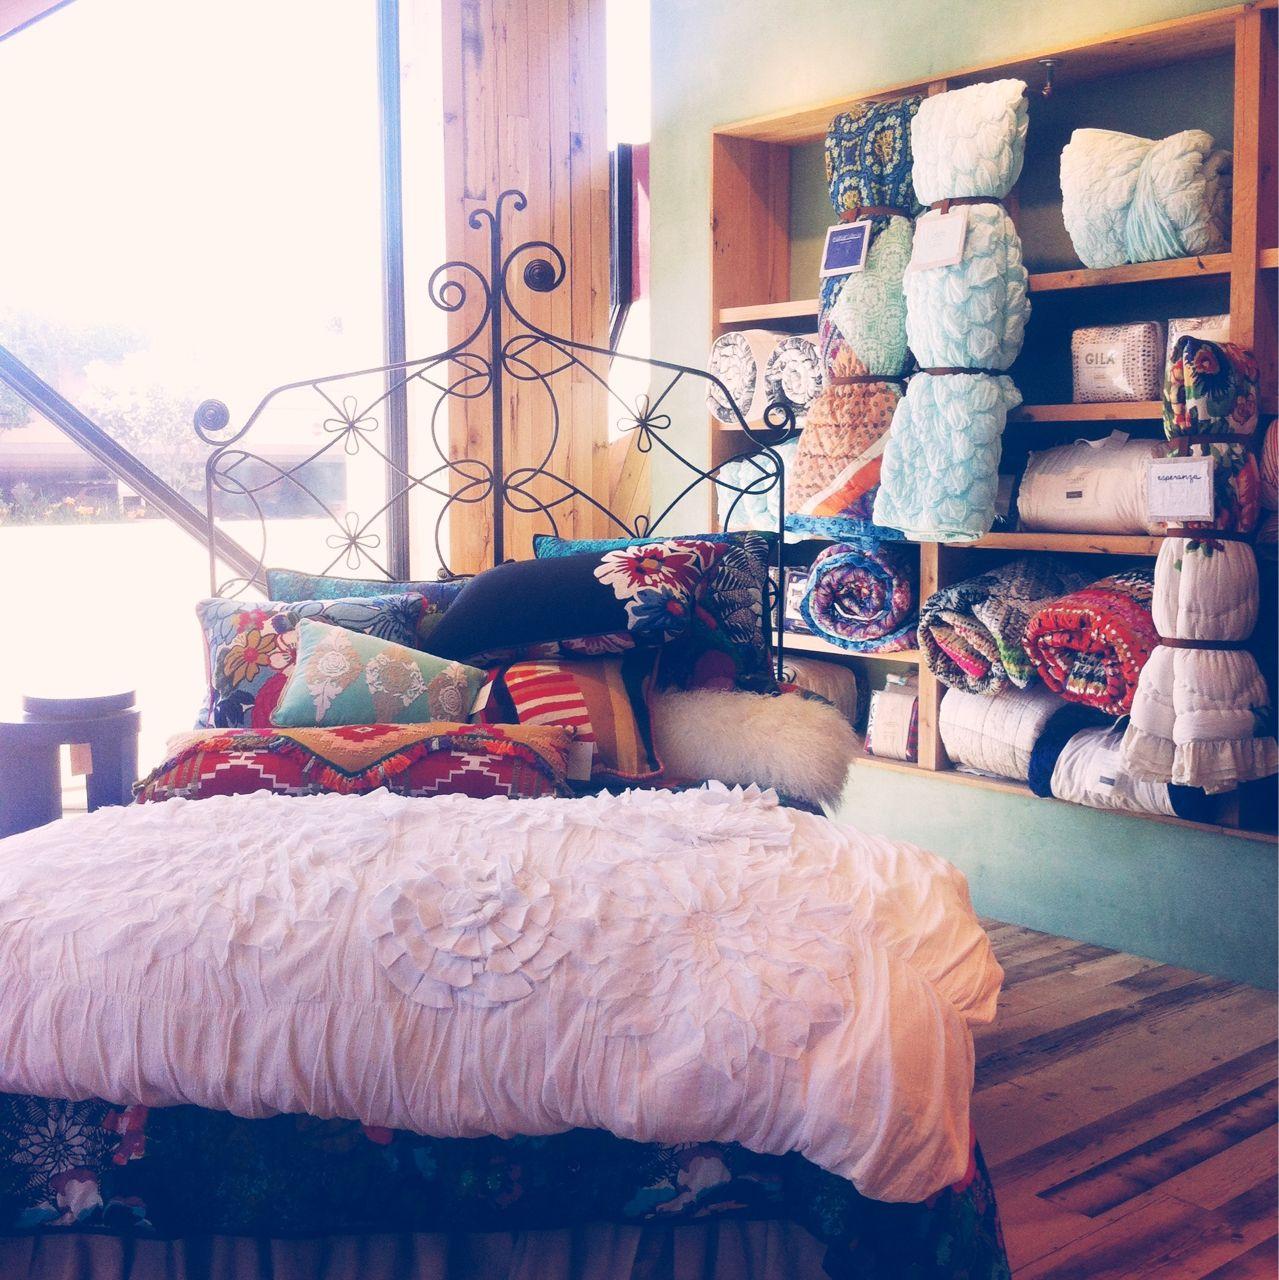 Anthropologie Store Costa Mesa / @jchongstudio On